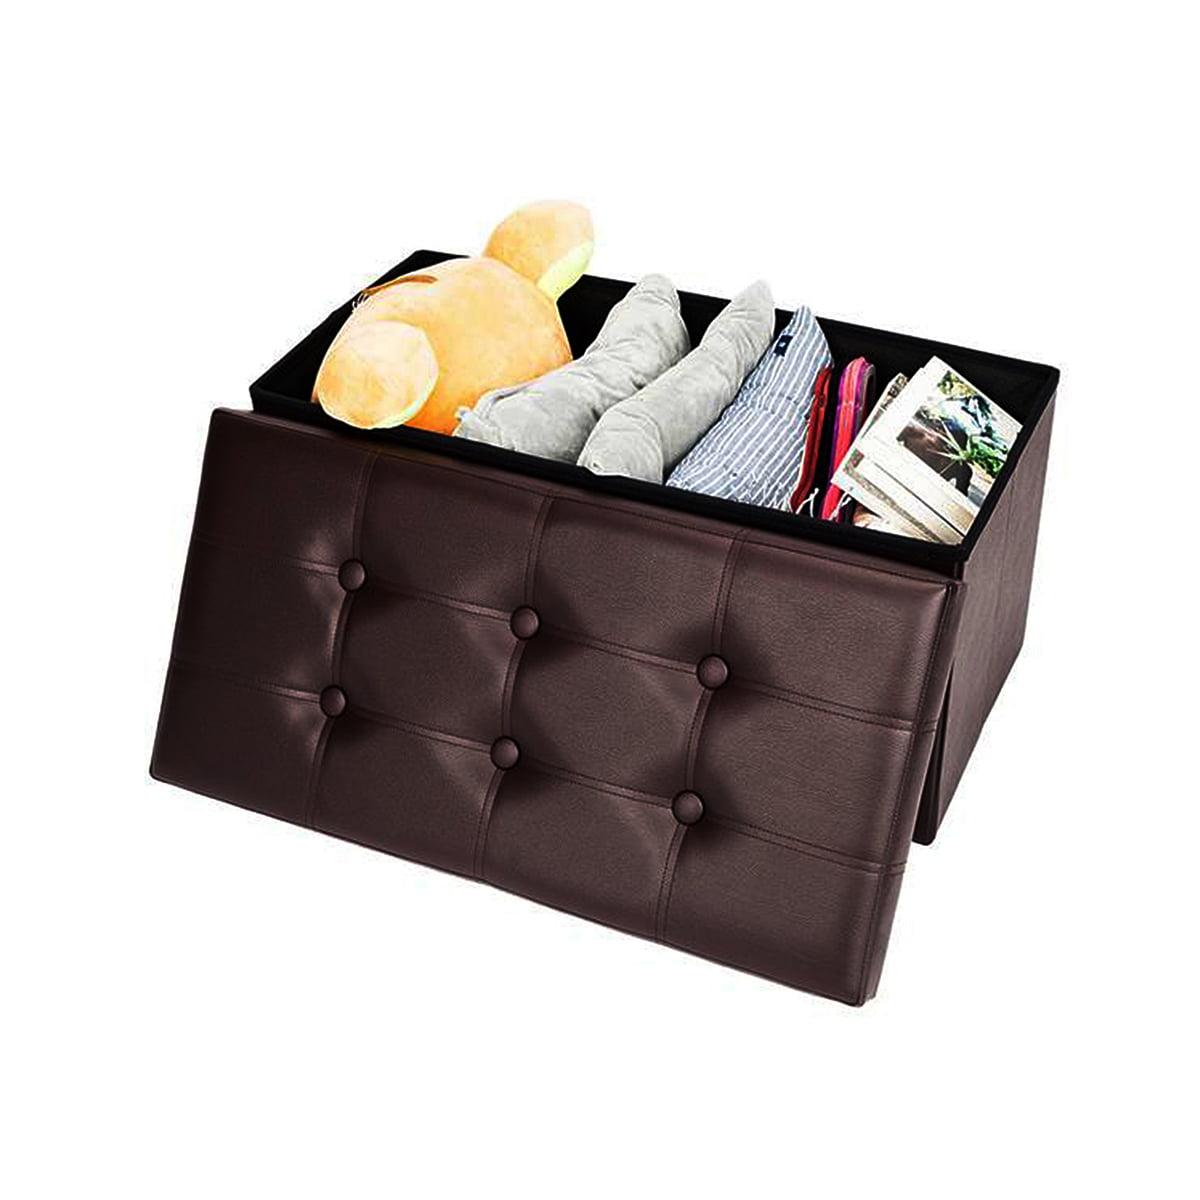 30'' folding storage ottoman bench box lounge leather seat